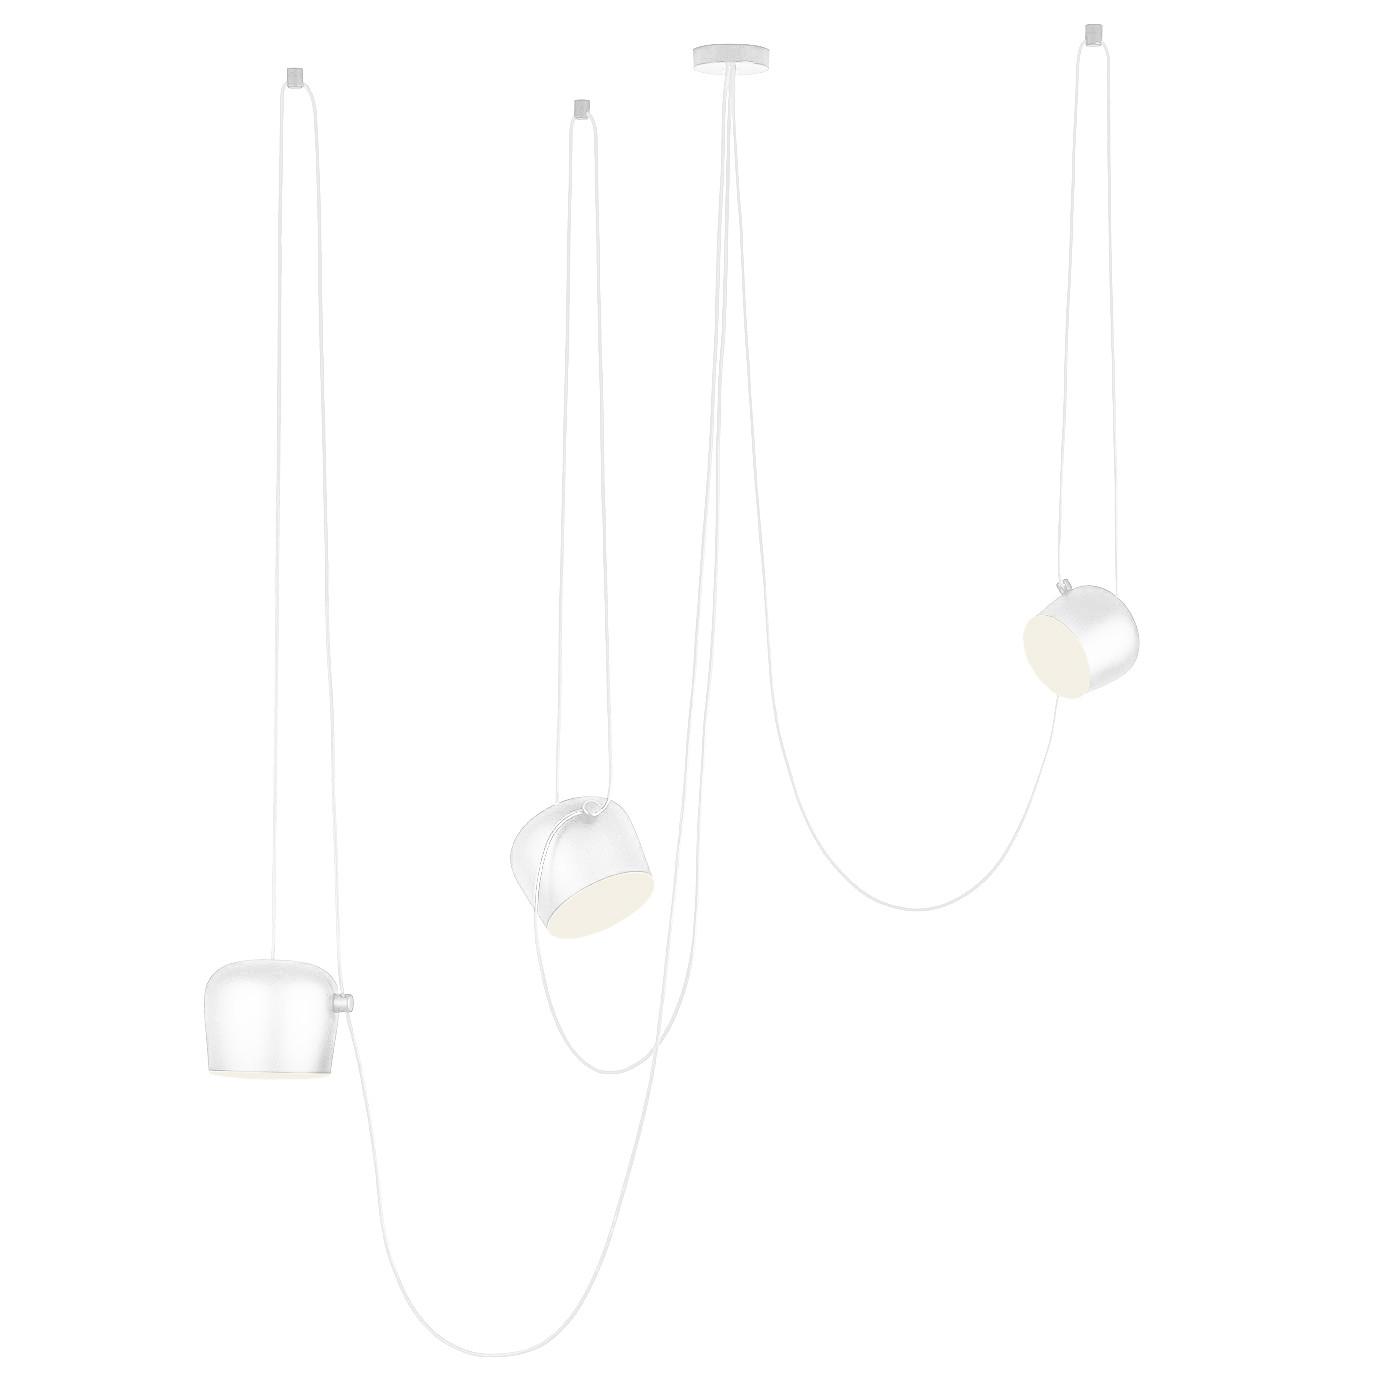 Flos Aim 3 Mixed Sospensione LED